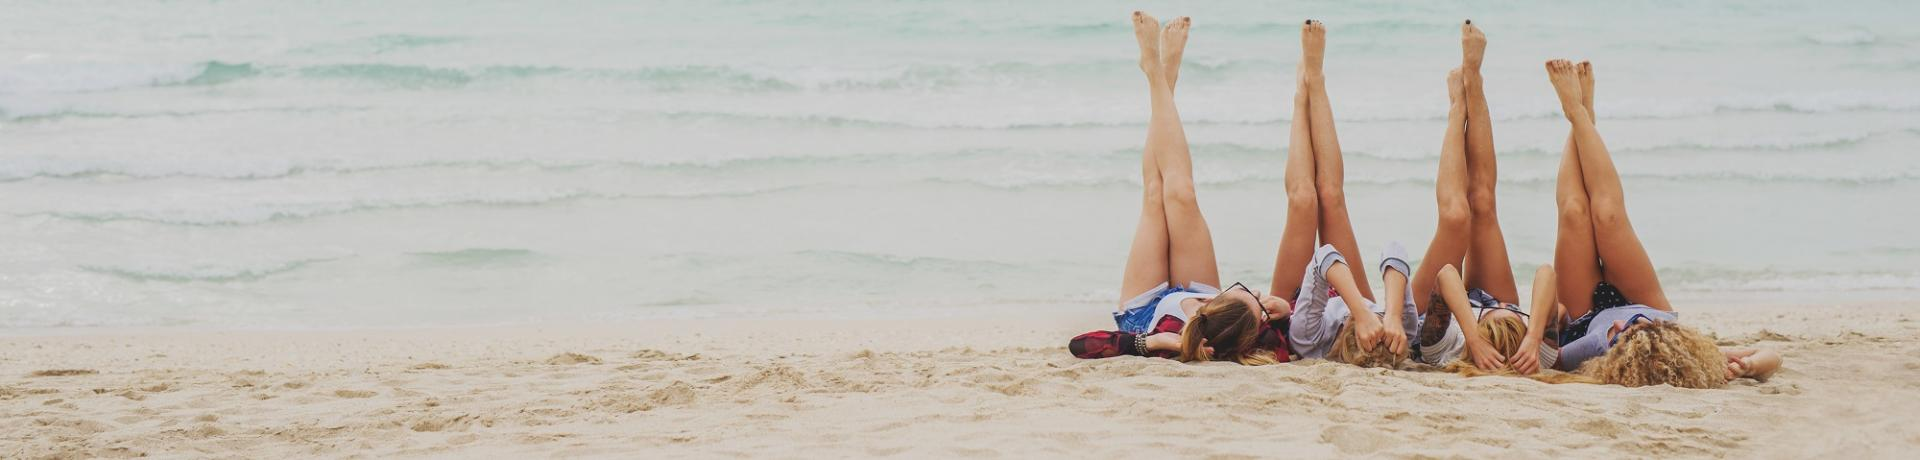 Sonstiges: Frauen Strand Meer Freundinnen